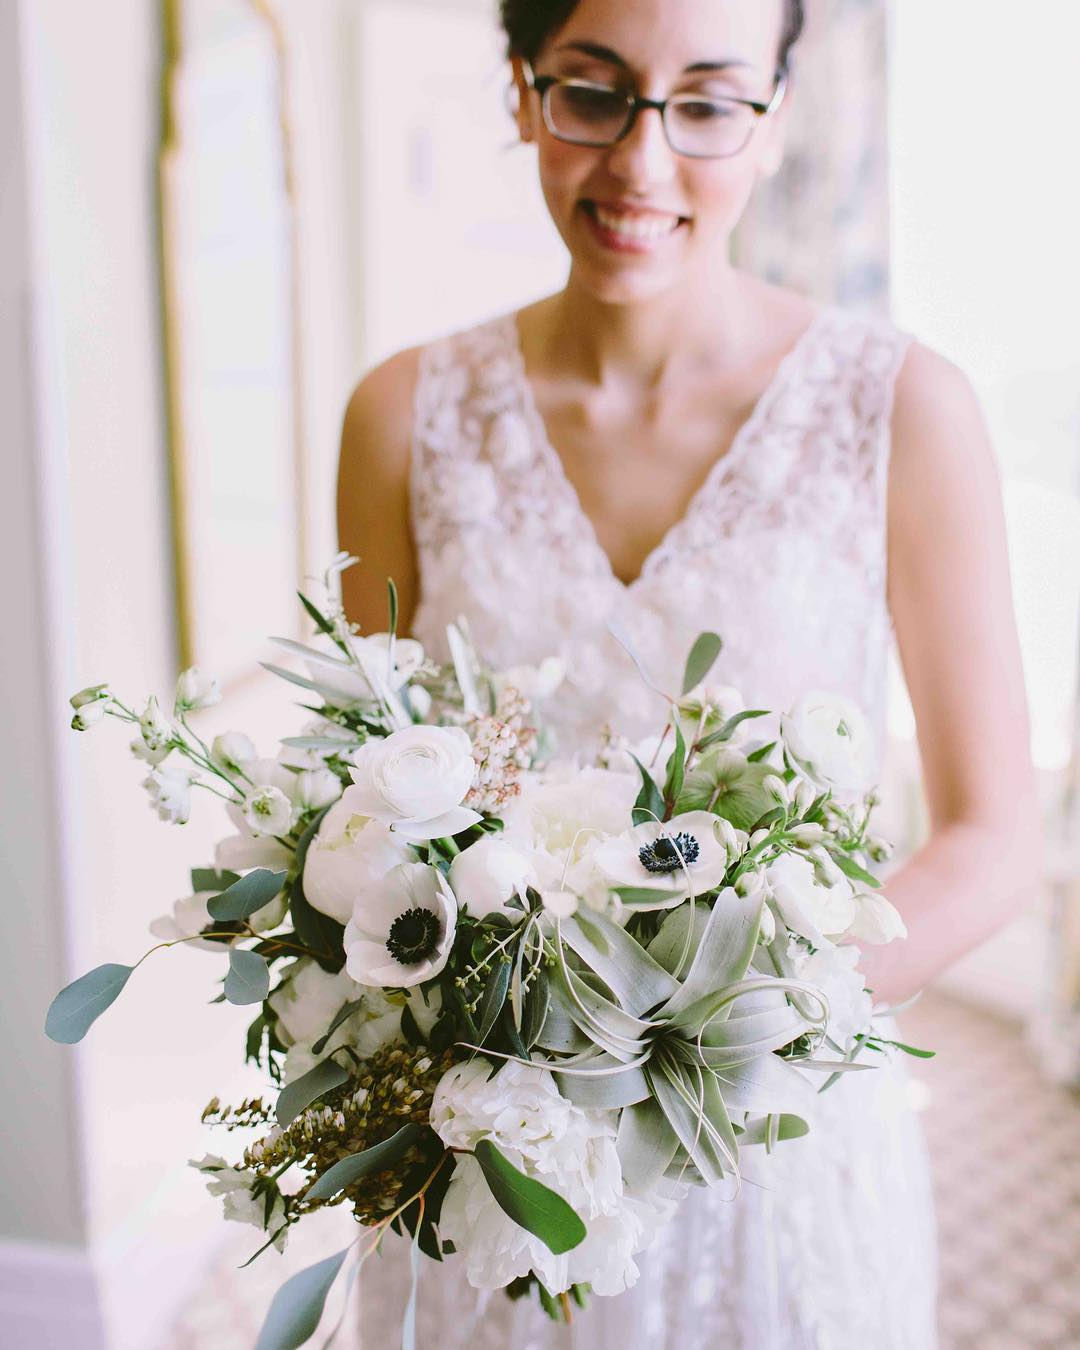 {how cute is she…} photo   @jamiemercuriophoto . . #weddingday #bride #bouquet #accessory #brideflowers #gettingmarried #forever #smilesarecontagious #love #happiness #joy #lotusfloraldesigns #weddingflowers